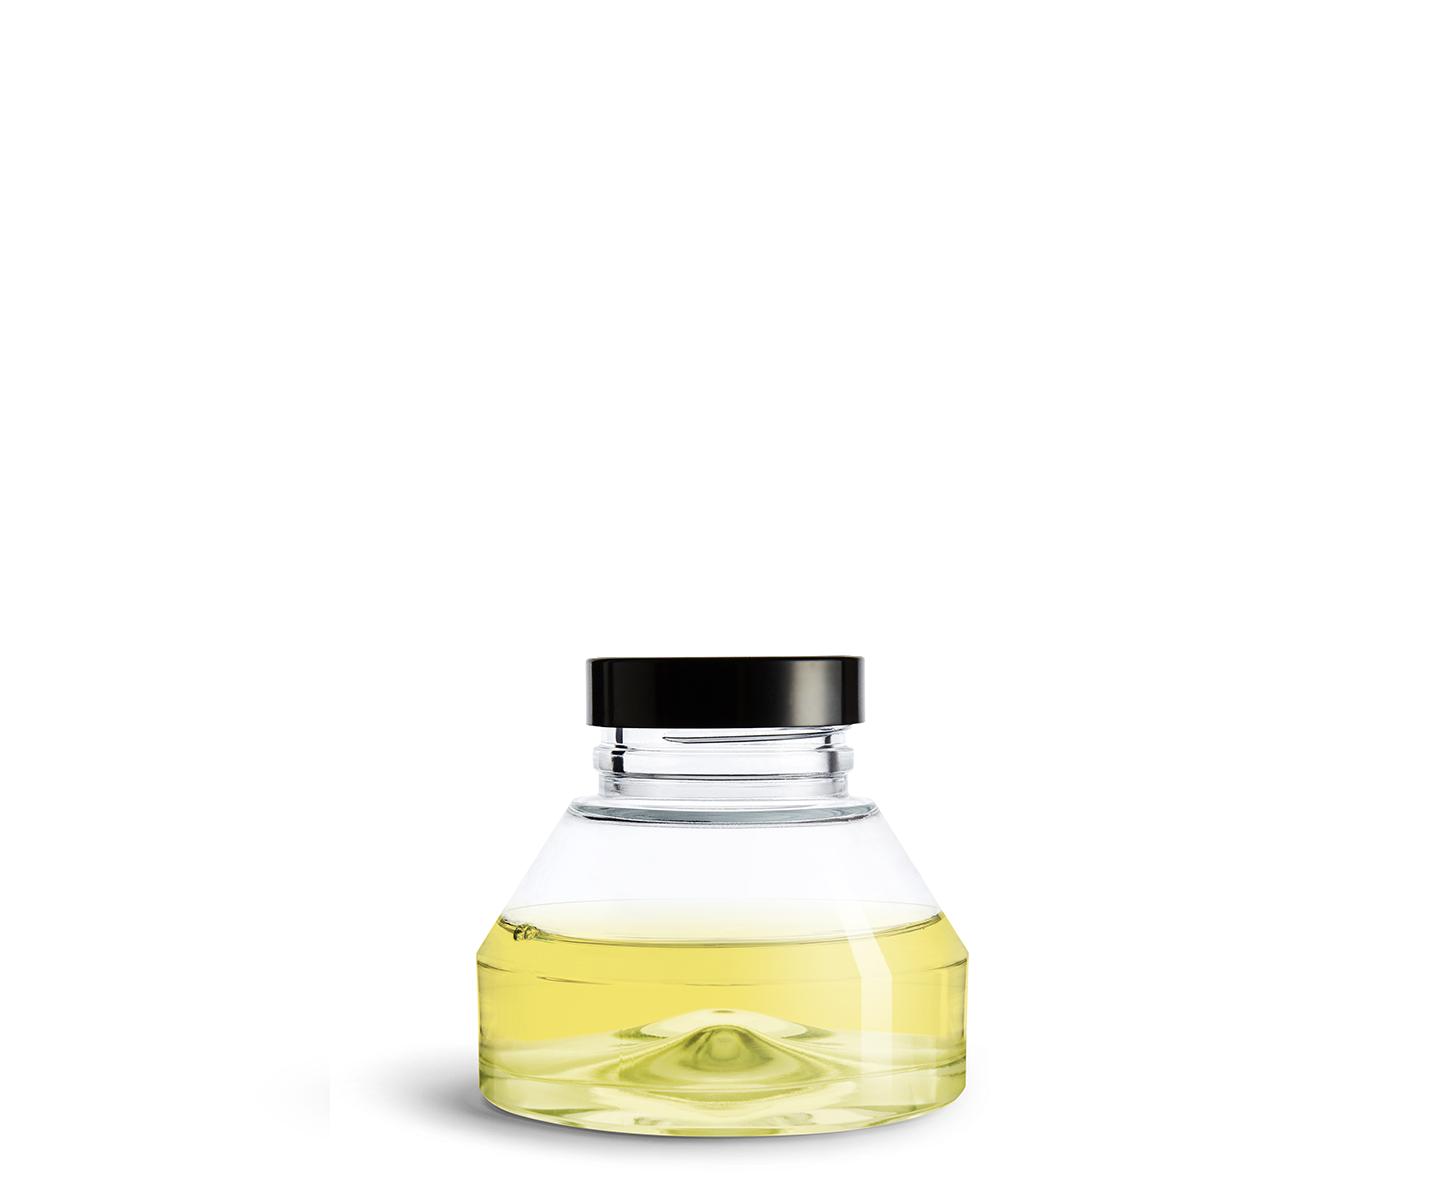 Fleur d'Oranger / Orange Blossom Hourglass Diffuser Refill 2.0